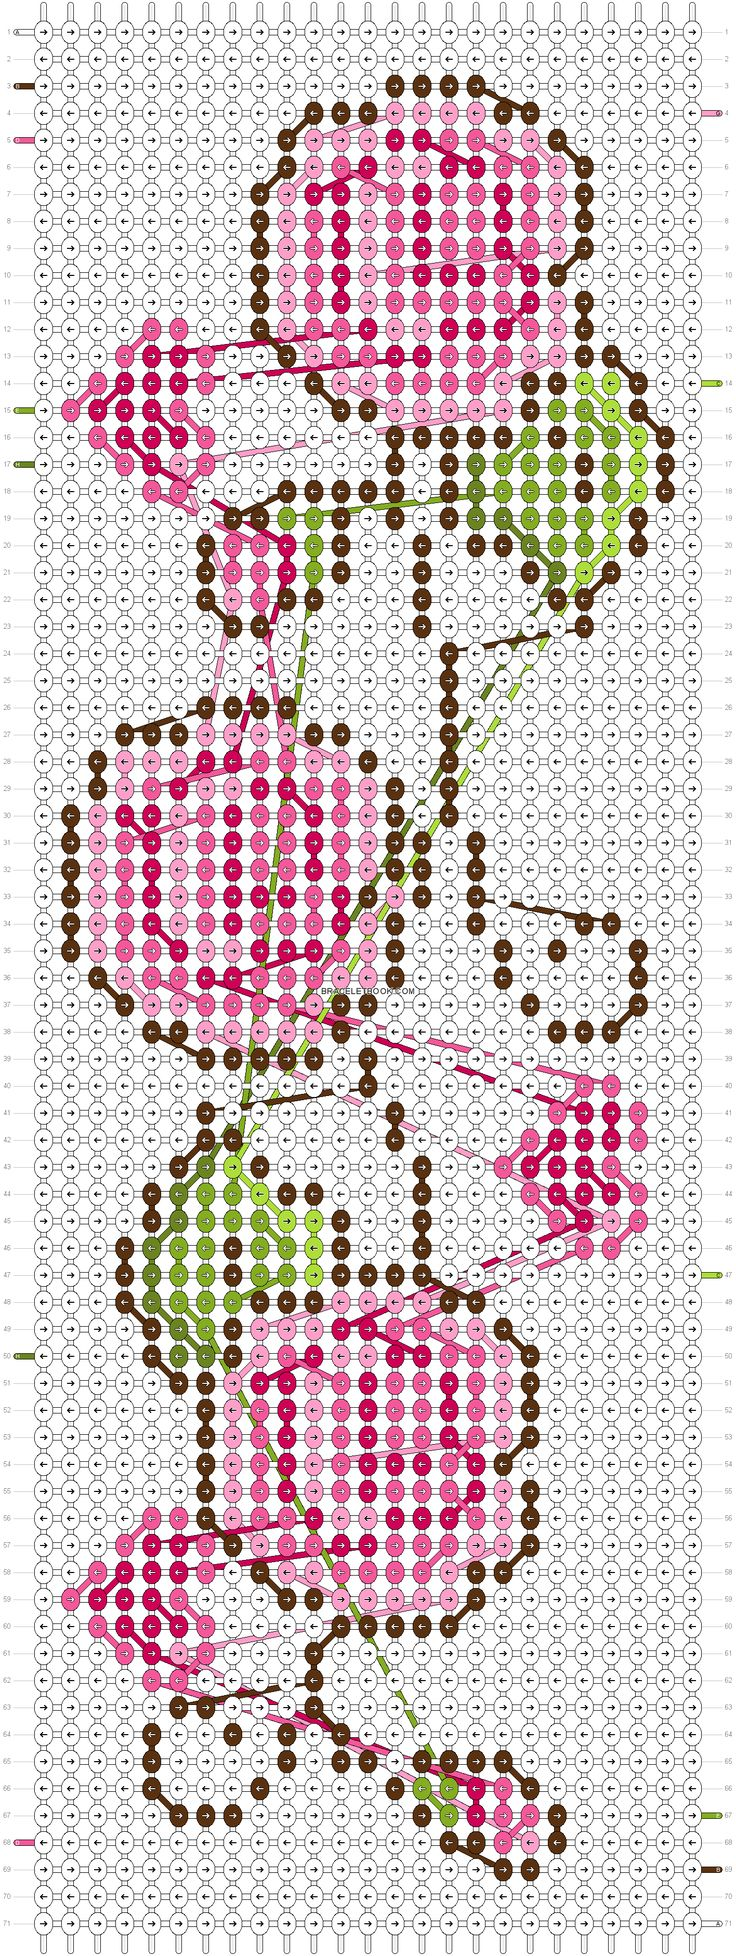 Alpha Pattern #17201 added by Xubu